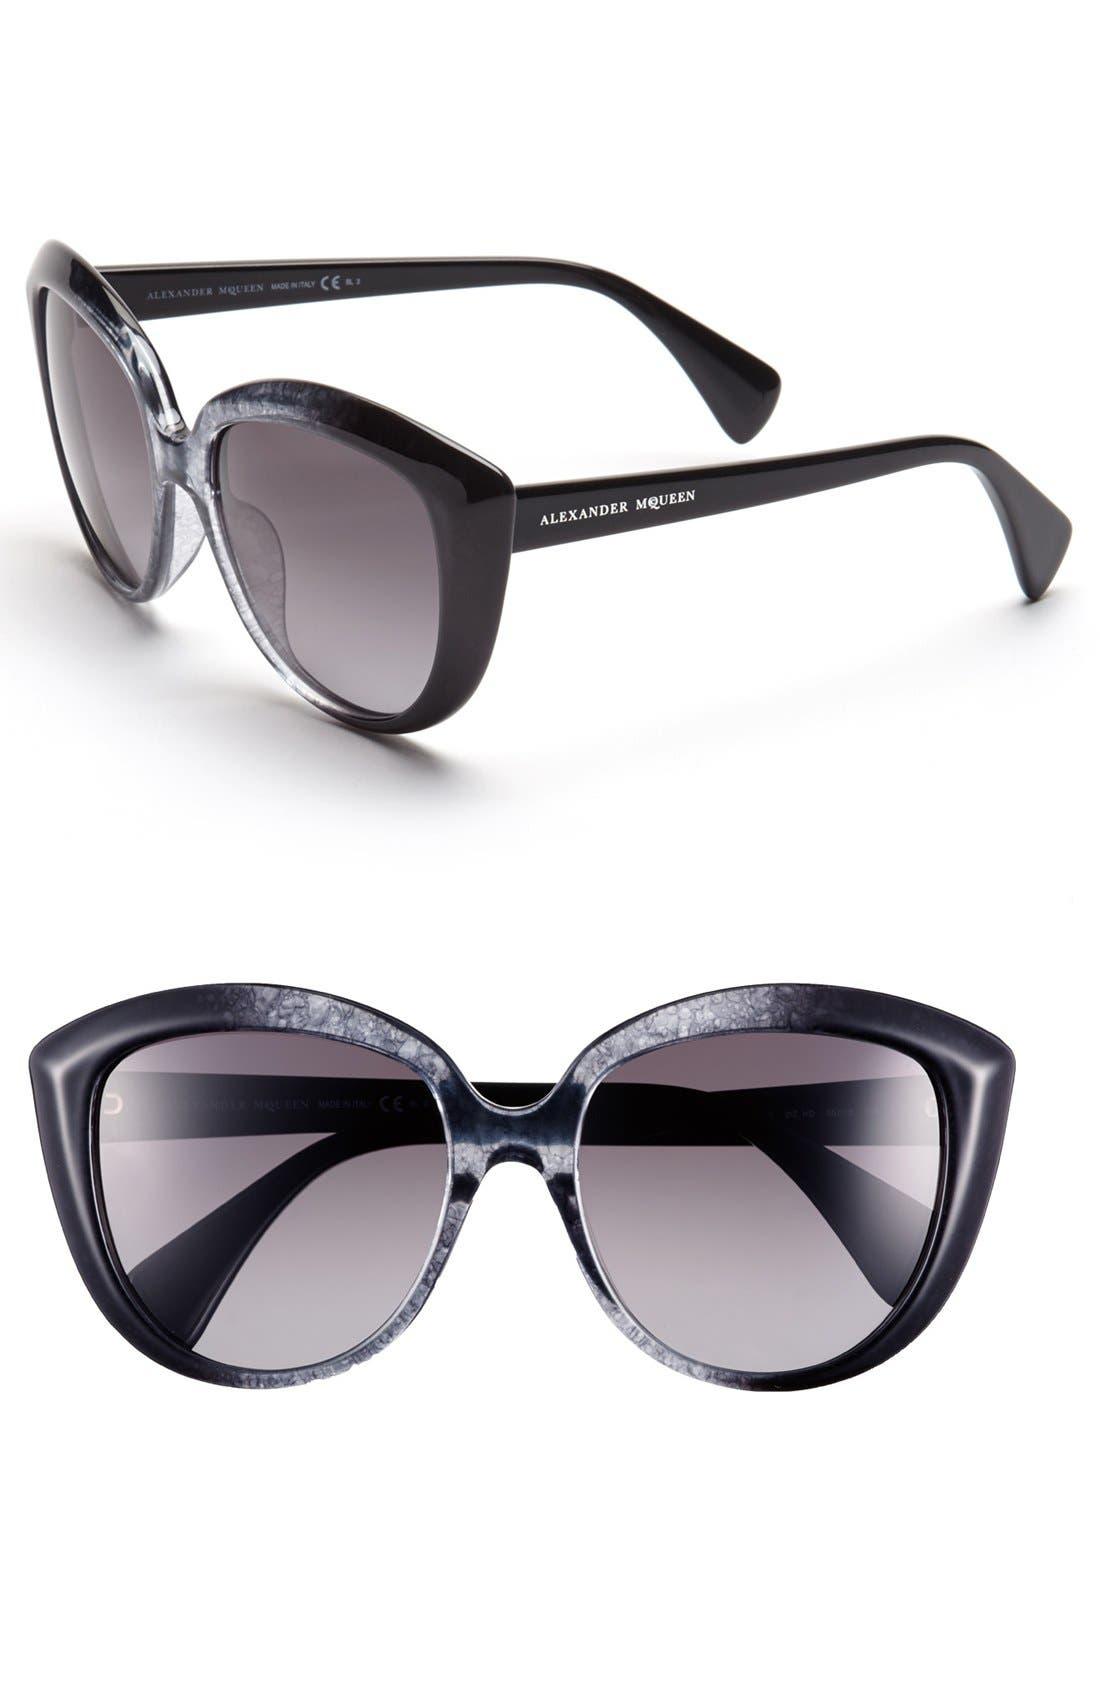 55mm Gradient Cat Eye Sunglasses,                         Main,                         color, Black/ Grey